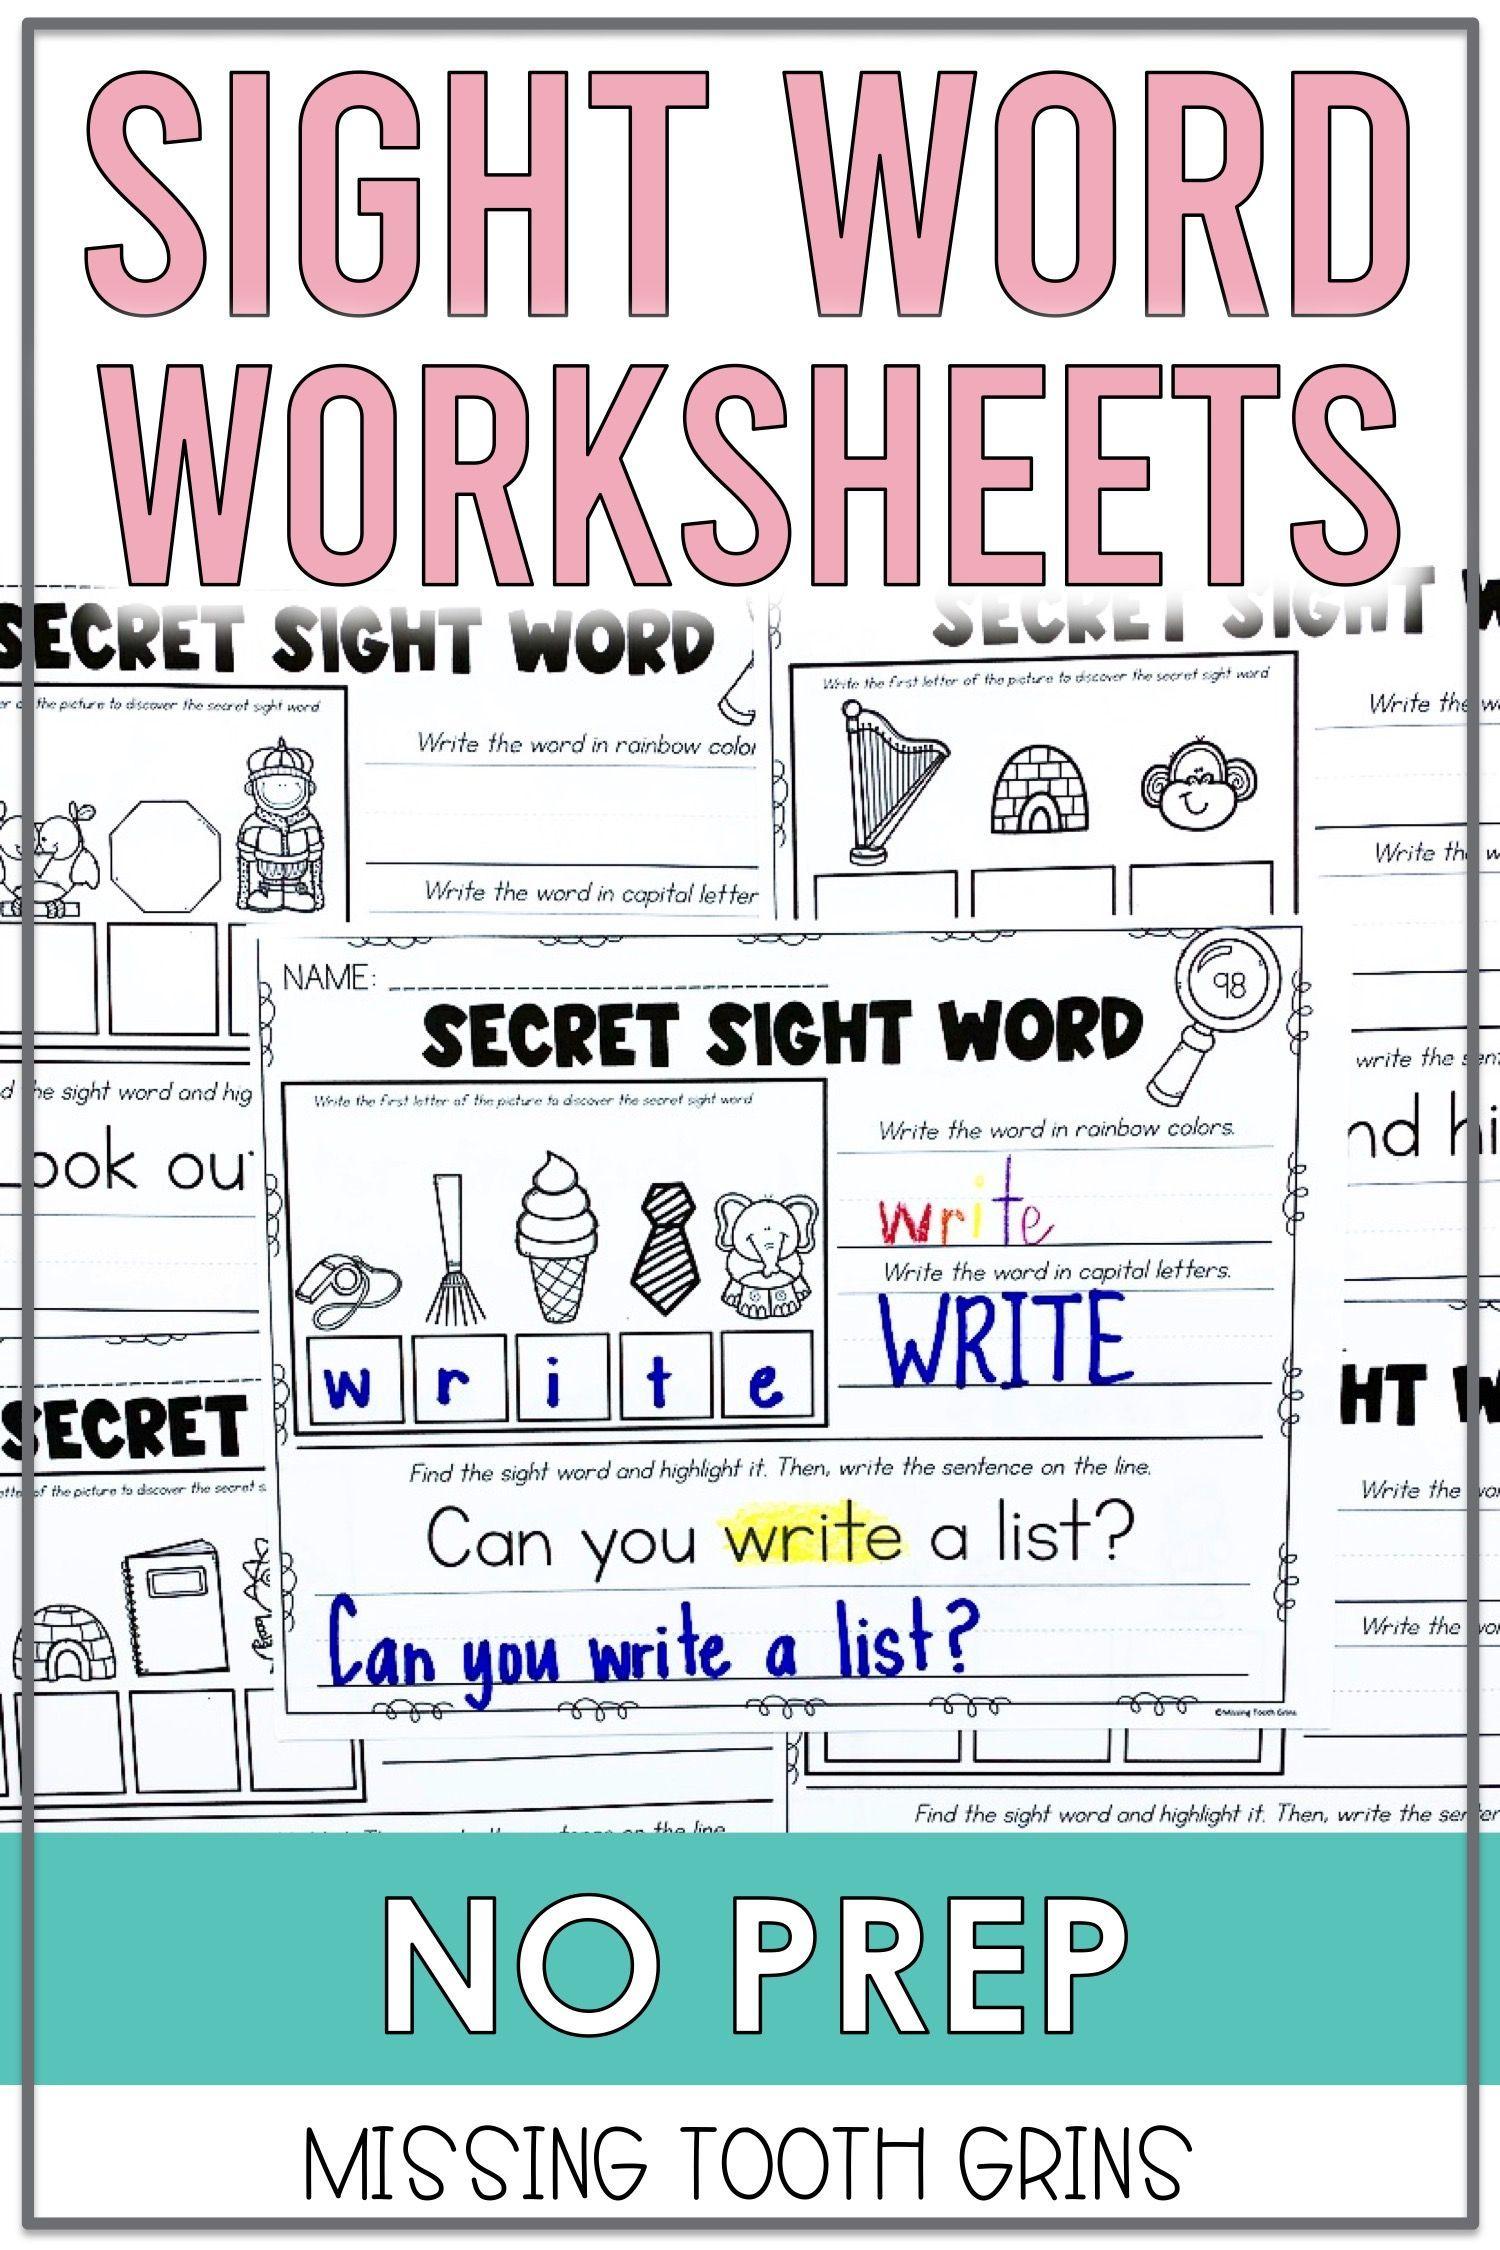 Sight Word Worksheets Sight Word Worksheets Writing Sight Words Sight Words [ 2250 x 1500 Pixel ]